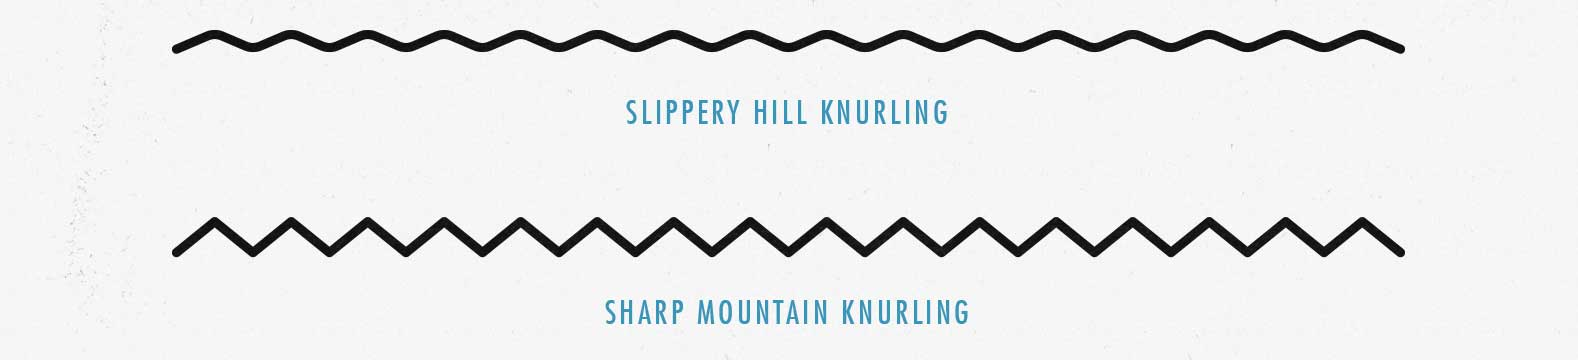 Slippery Hill